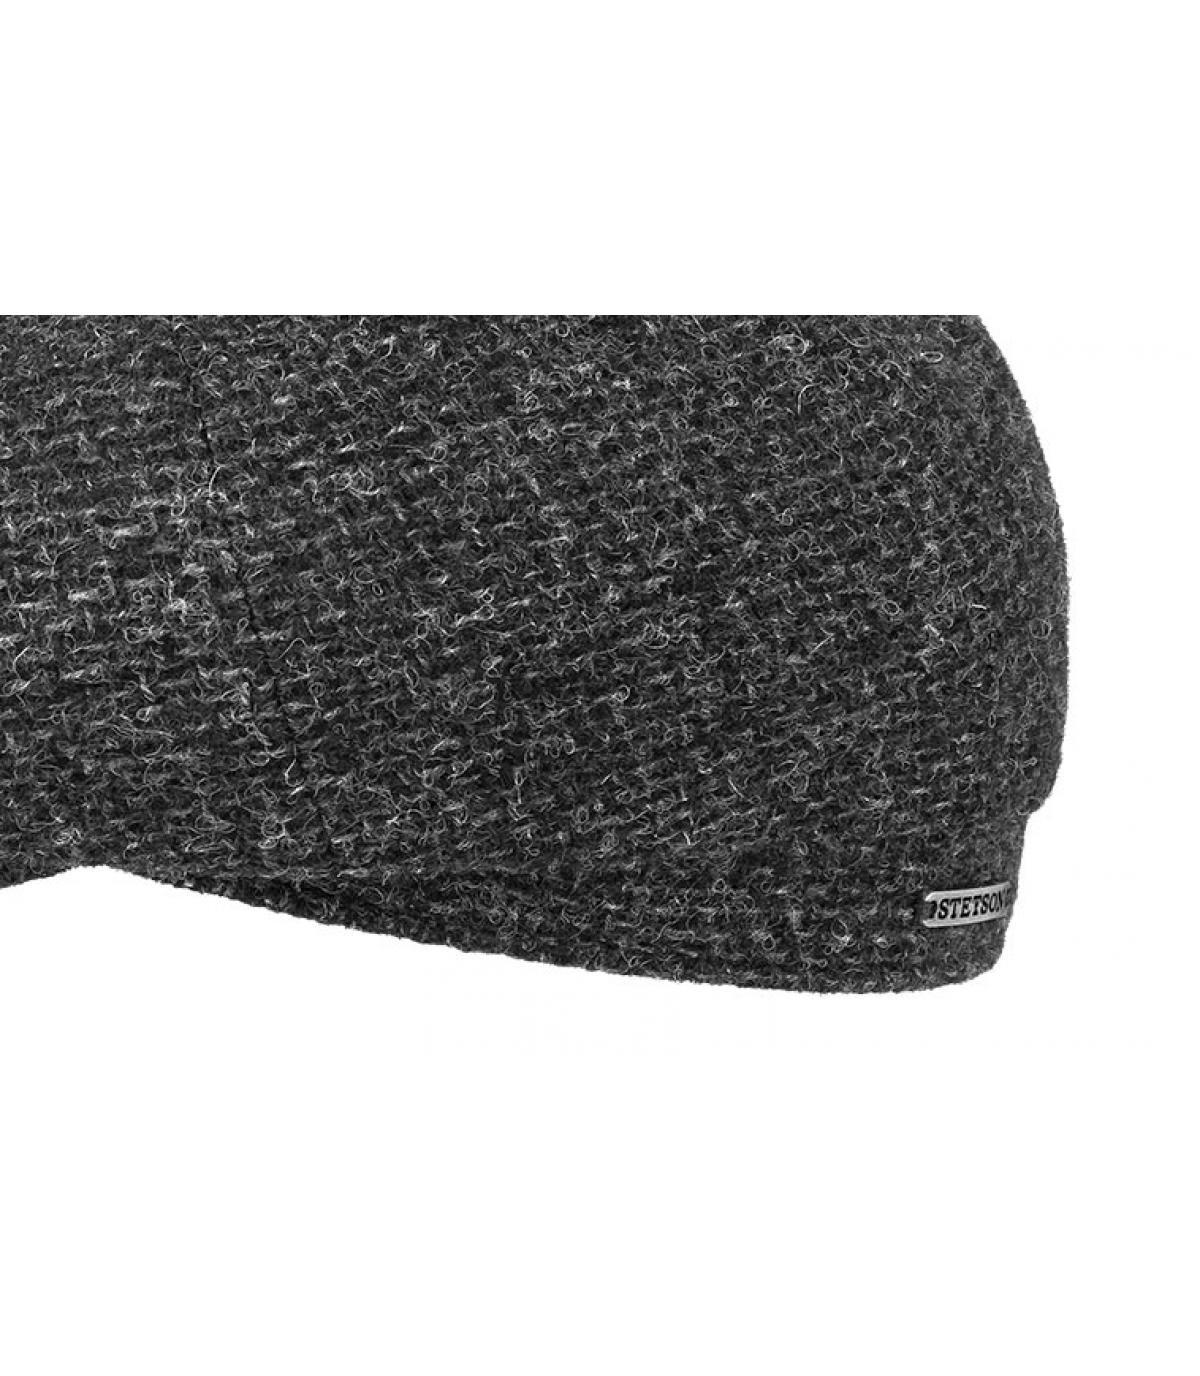 Détails Hatteras Wool grey - image 3